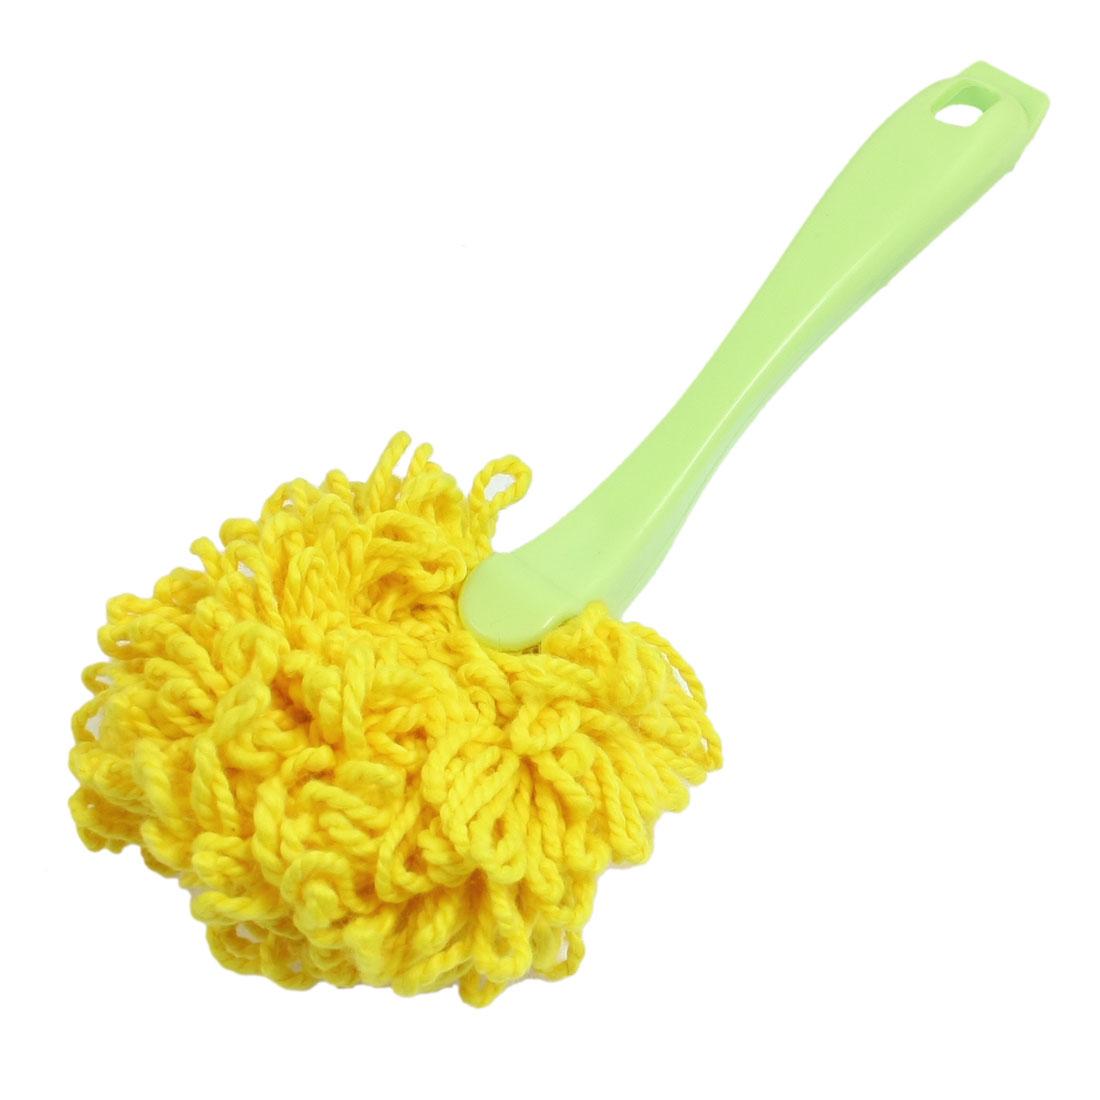 Green Plastic Handle Furniture Book Sweeping Cleaning Brush Broom